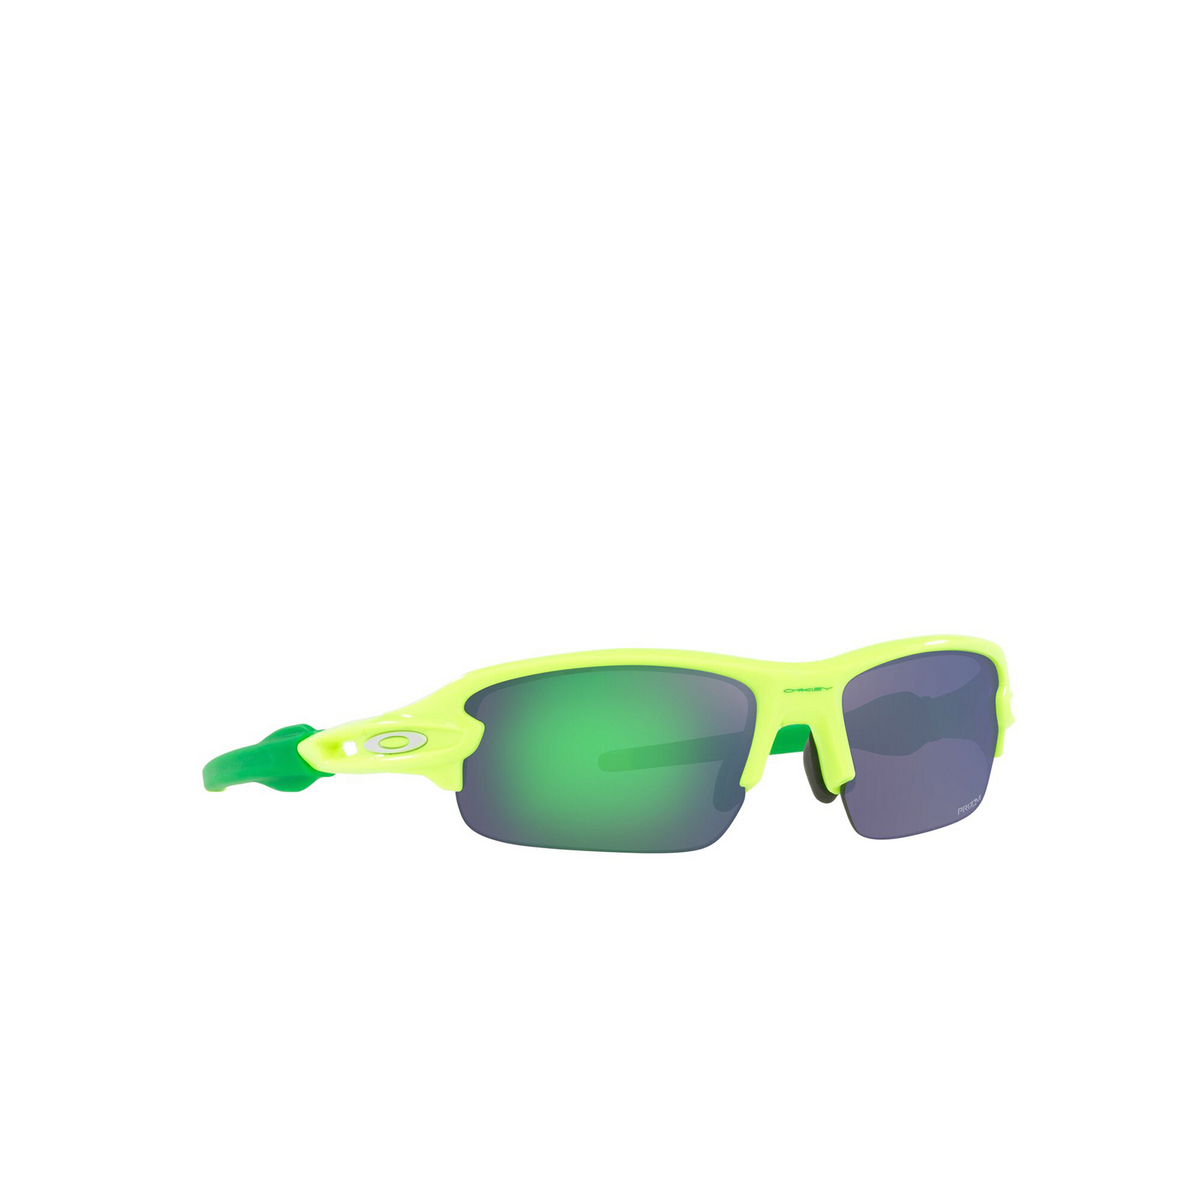 Oakley® Rectangle Sunglasses: Flak Xxs OJ9008 color Retina Burn 900804 - three-quarters view.